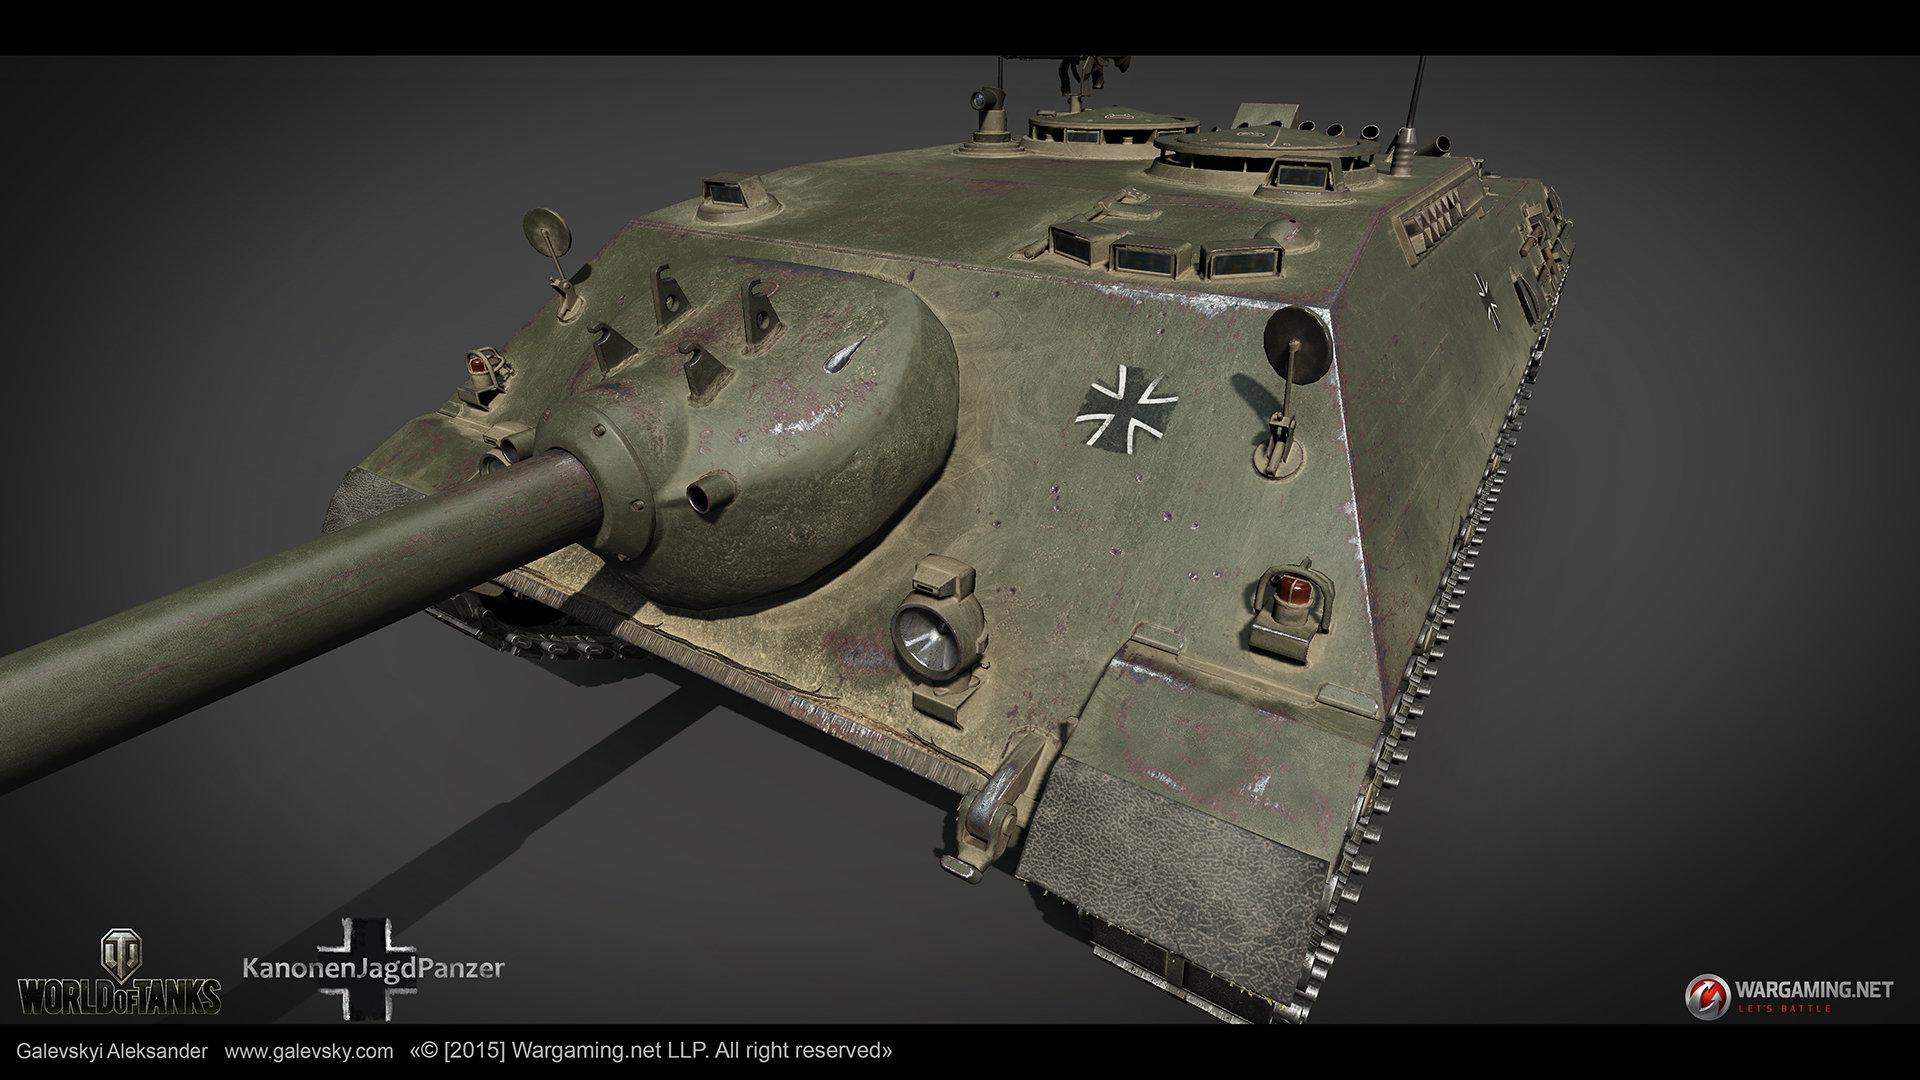 Aleksander galevskyi kanonenjagdpanzer fin small 05